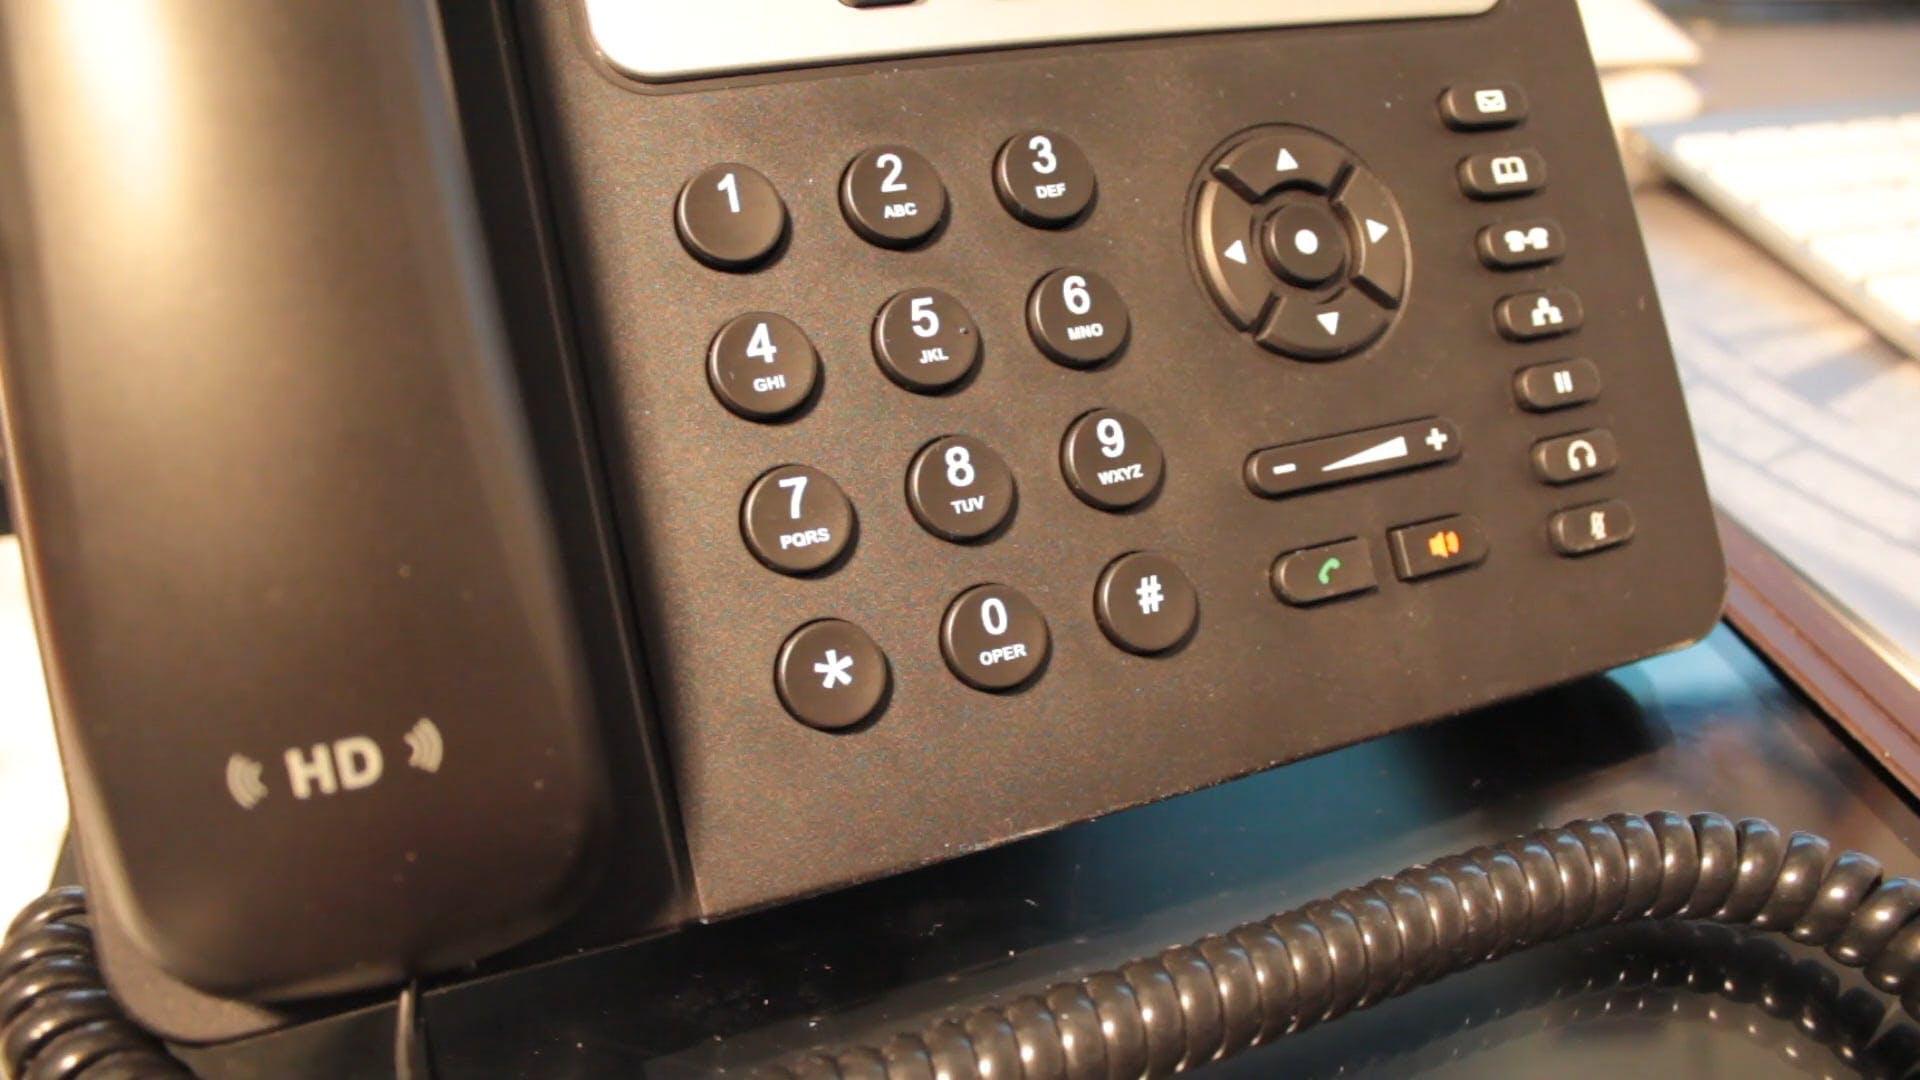 Using a Landline Telephone